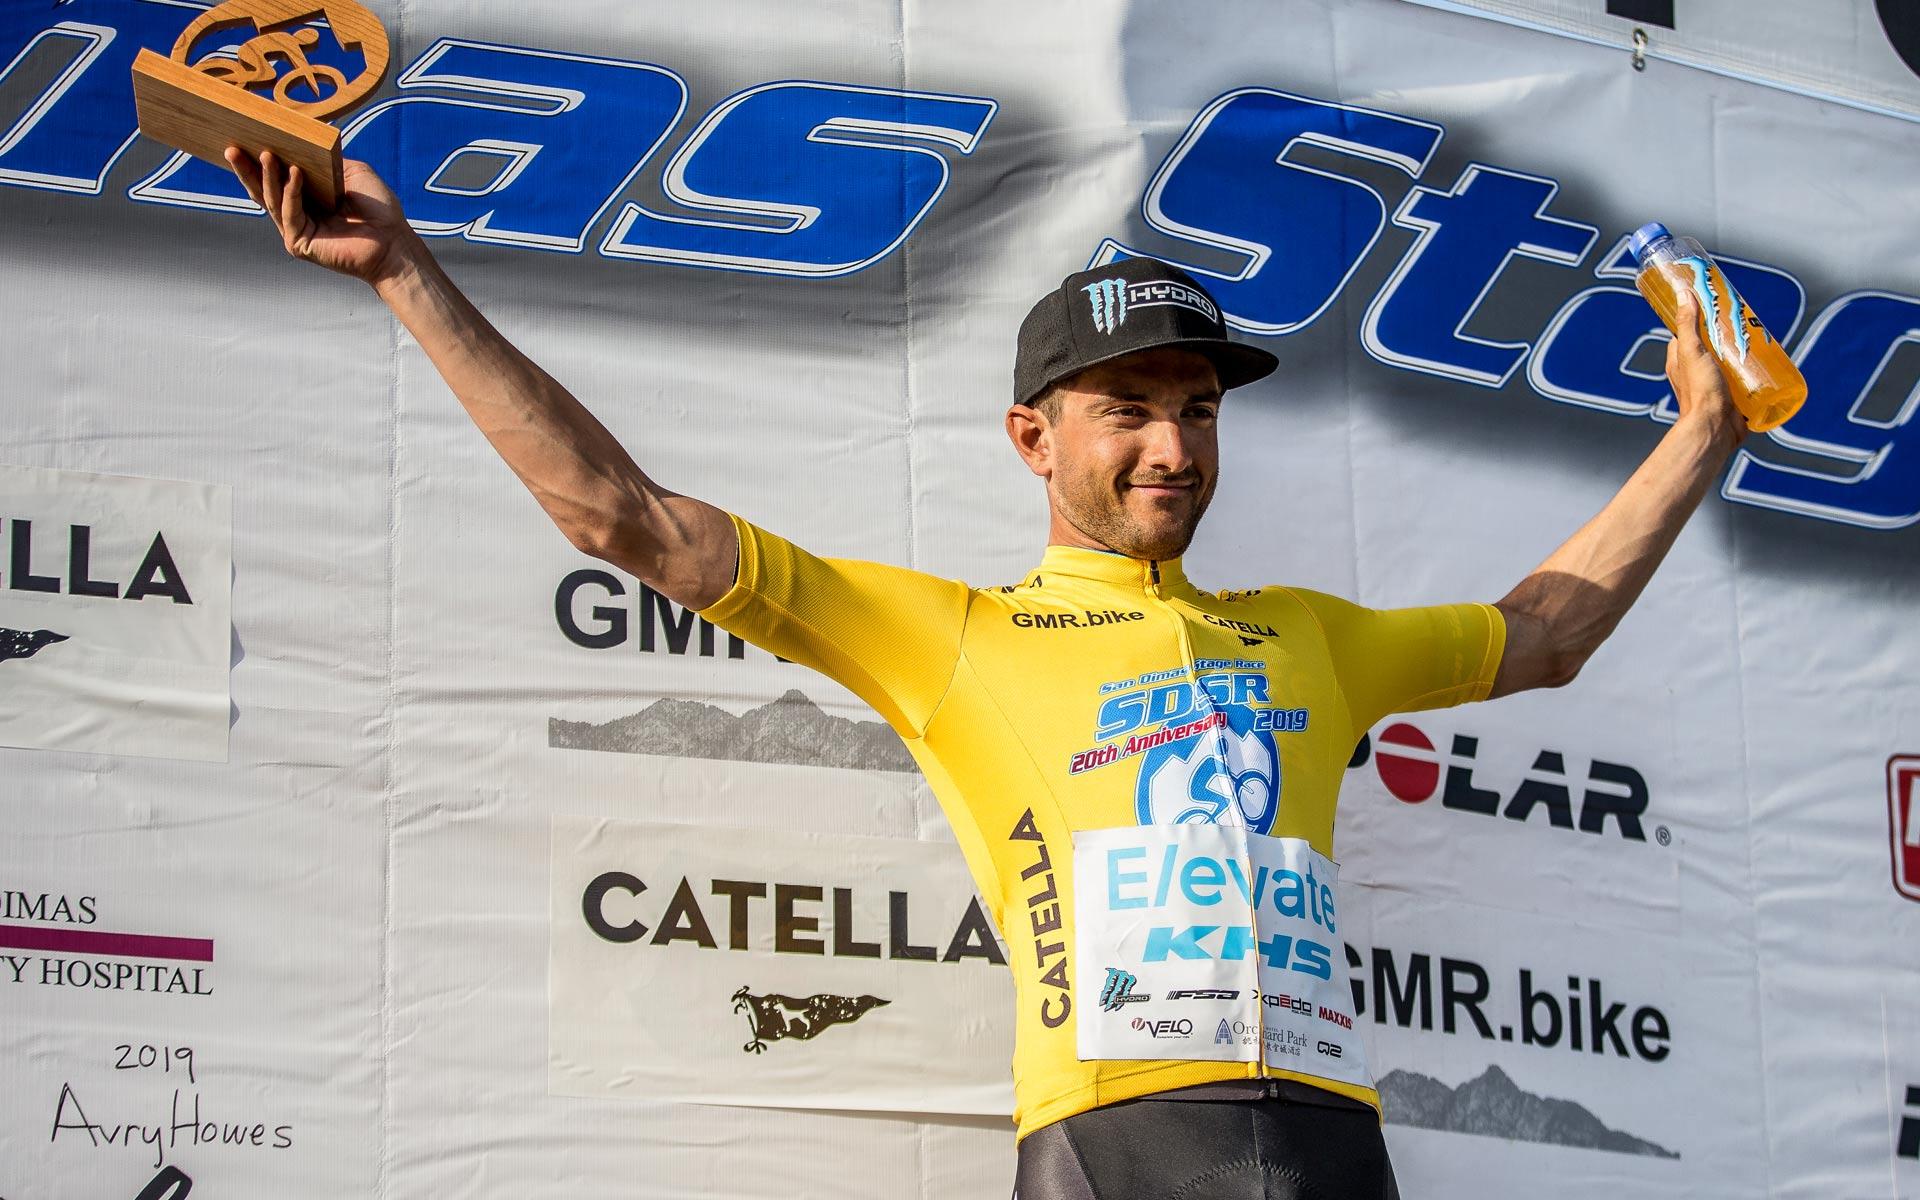 KHS Yellow Jersey on the winner's podium